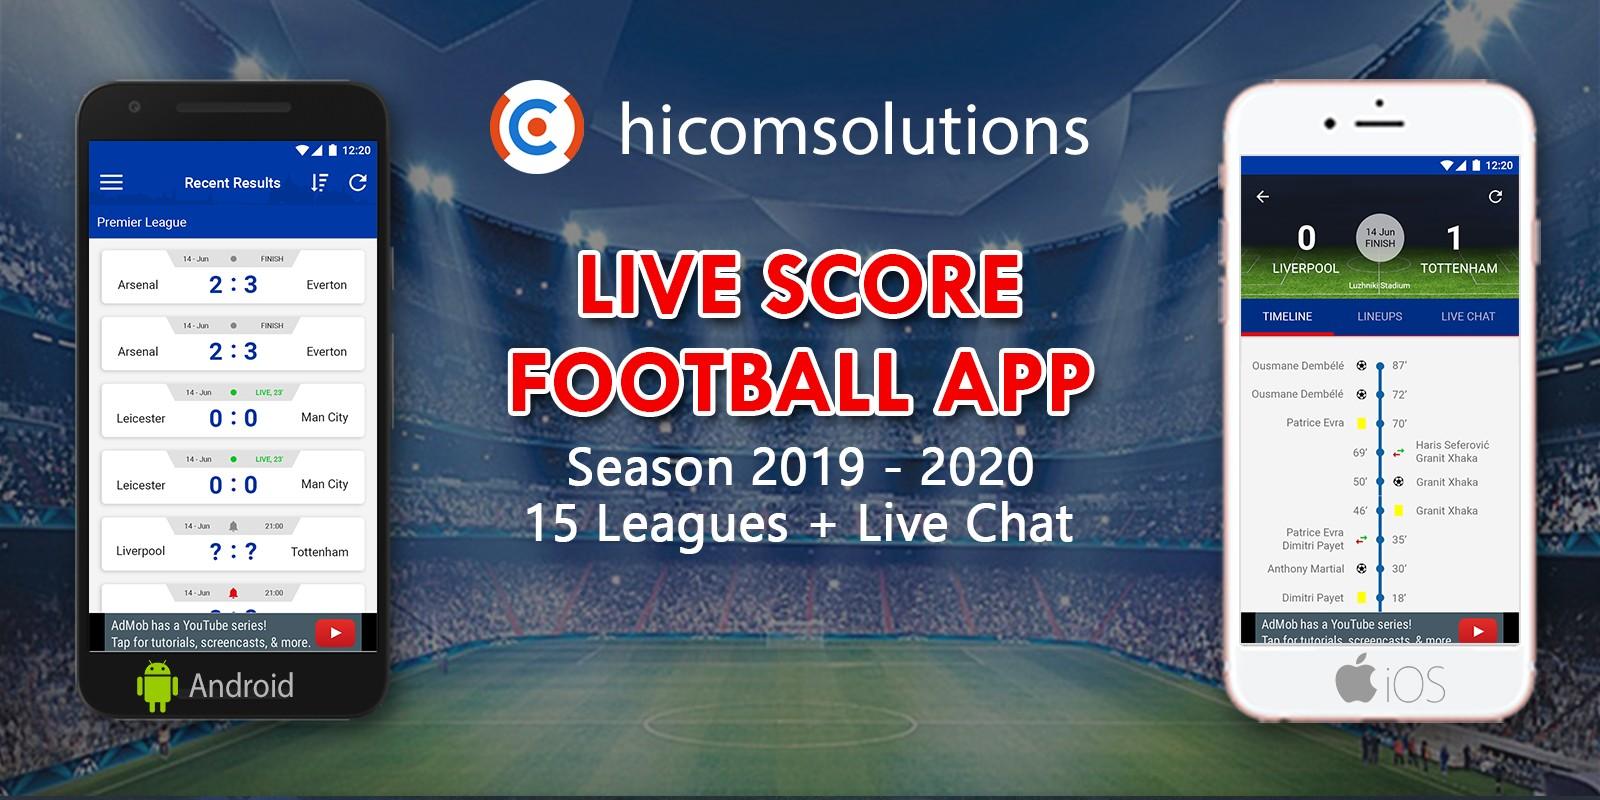 Livescore Football App Season 2019-20 For iOS